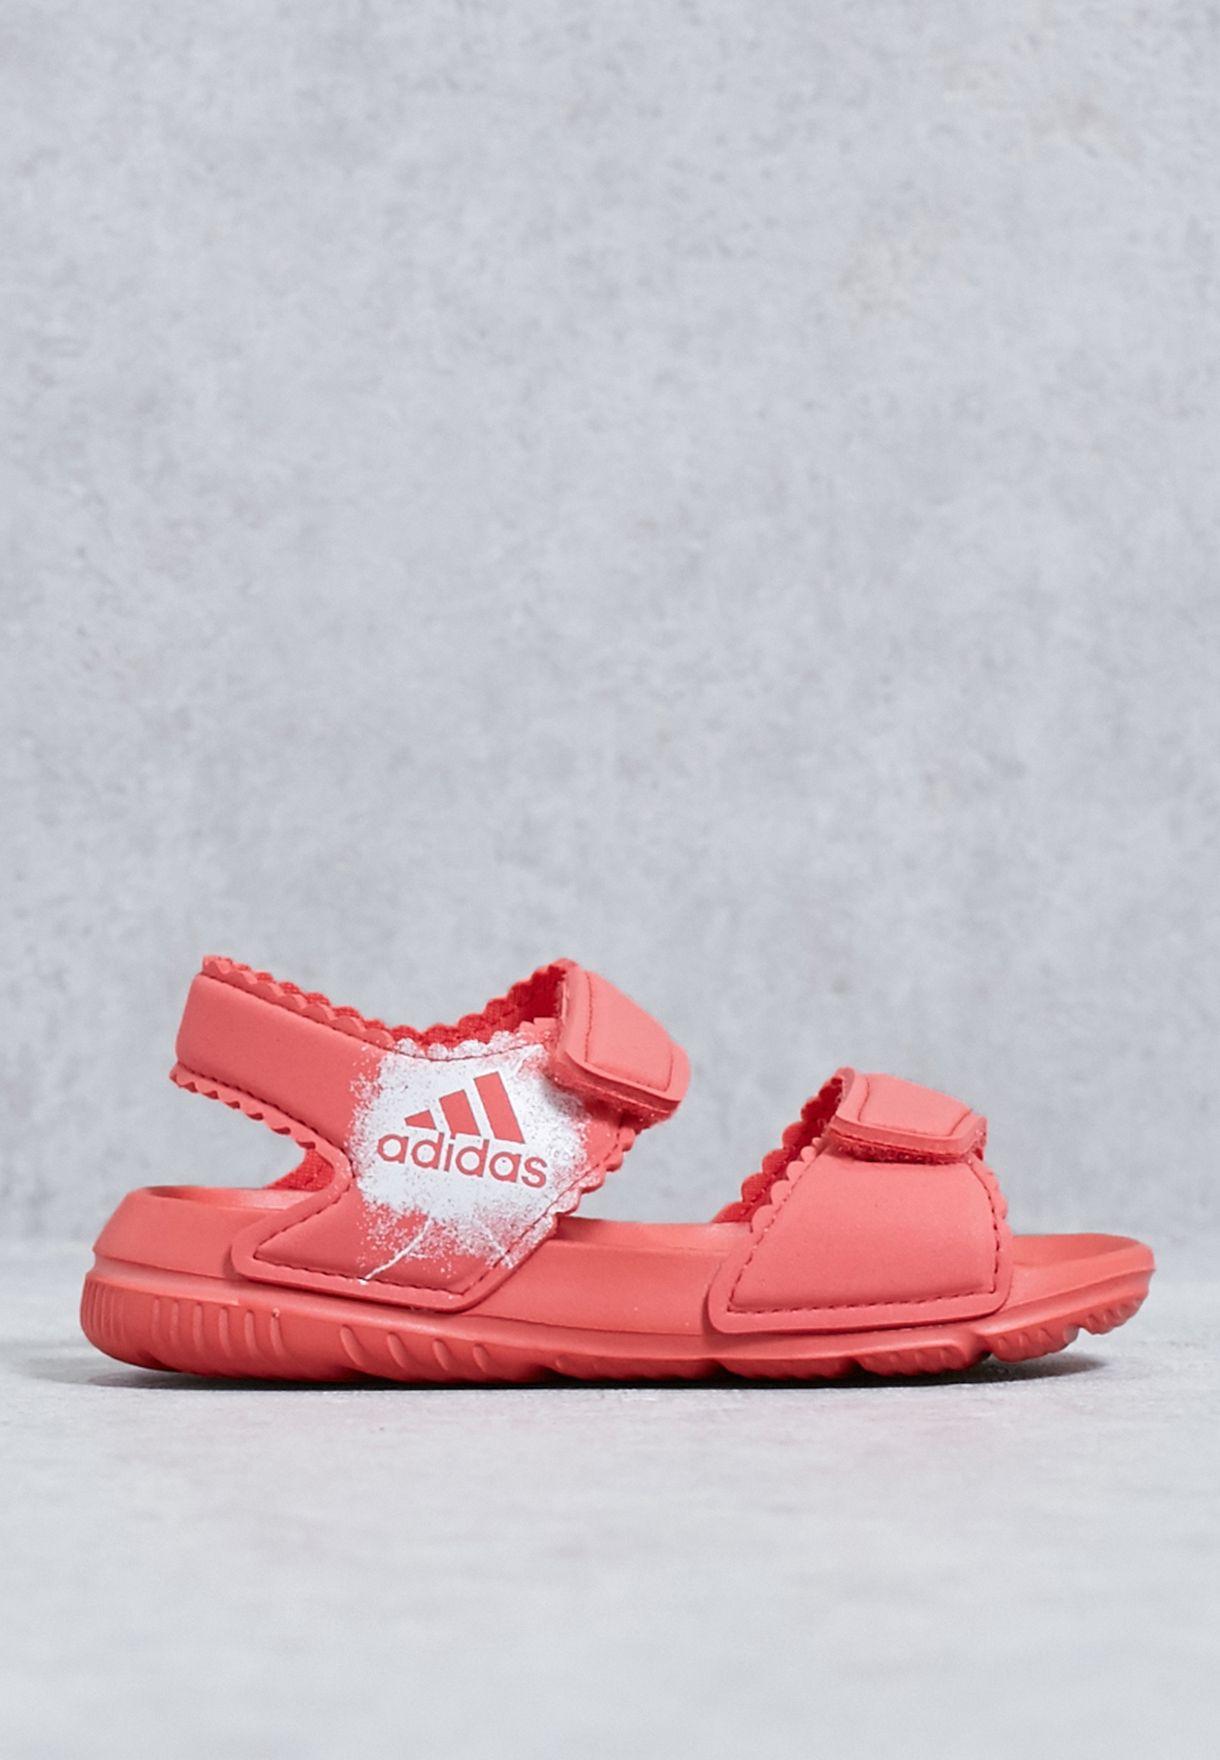 separation shoes 40e6e 5b72e Shop adidas red Infant AltaSwim BA7868 for Kids in Qatar - A